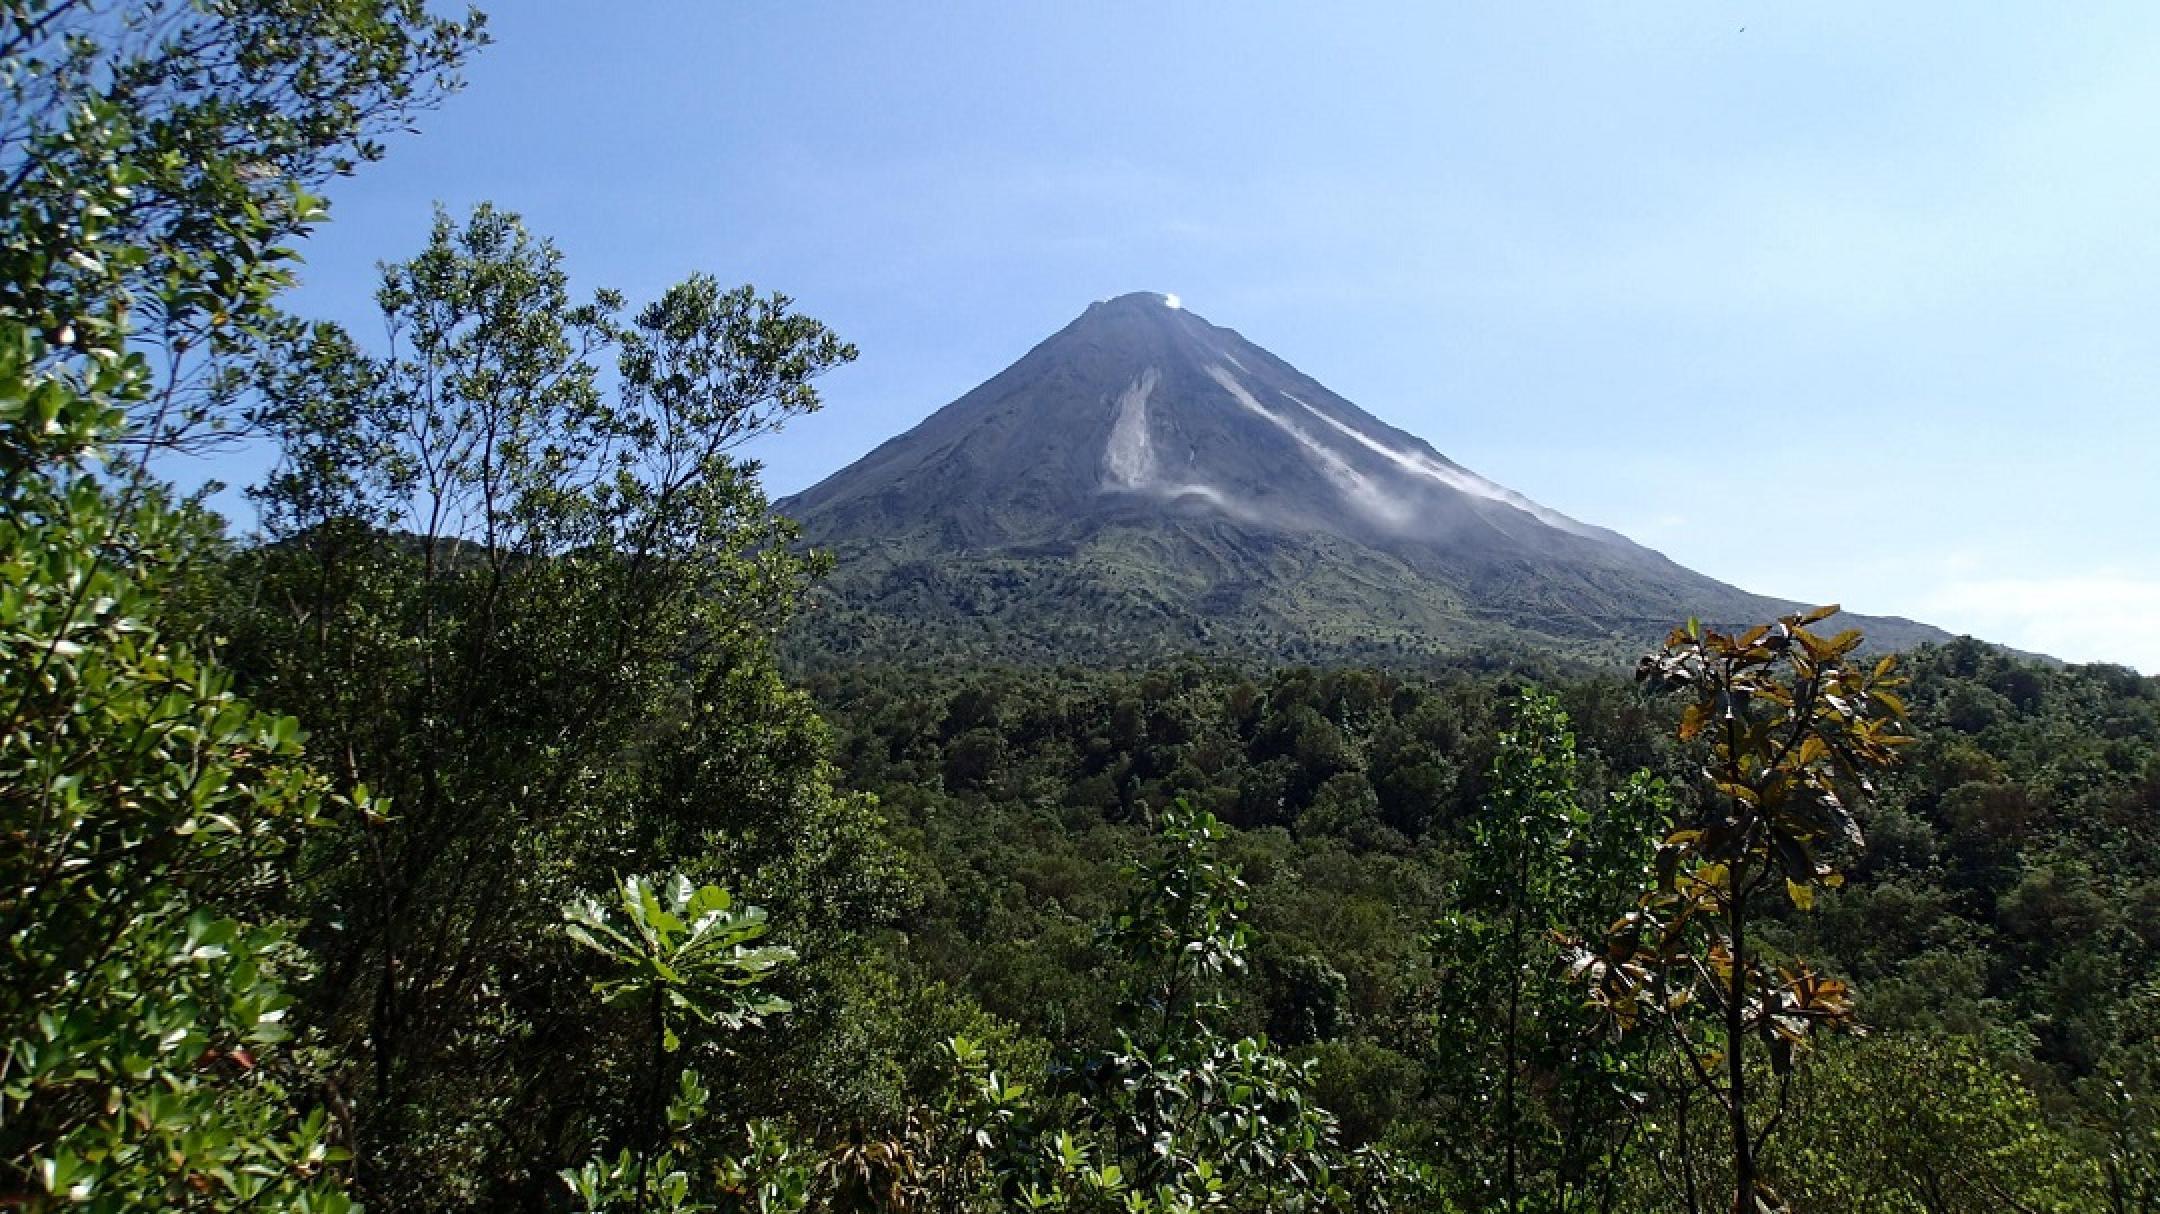 Arenal Volcano 1968 Eruption History